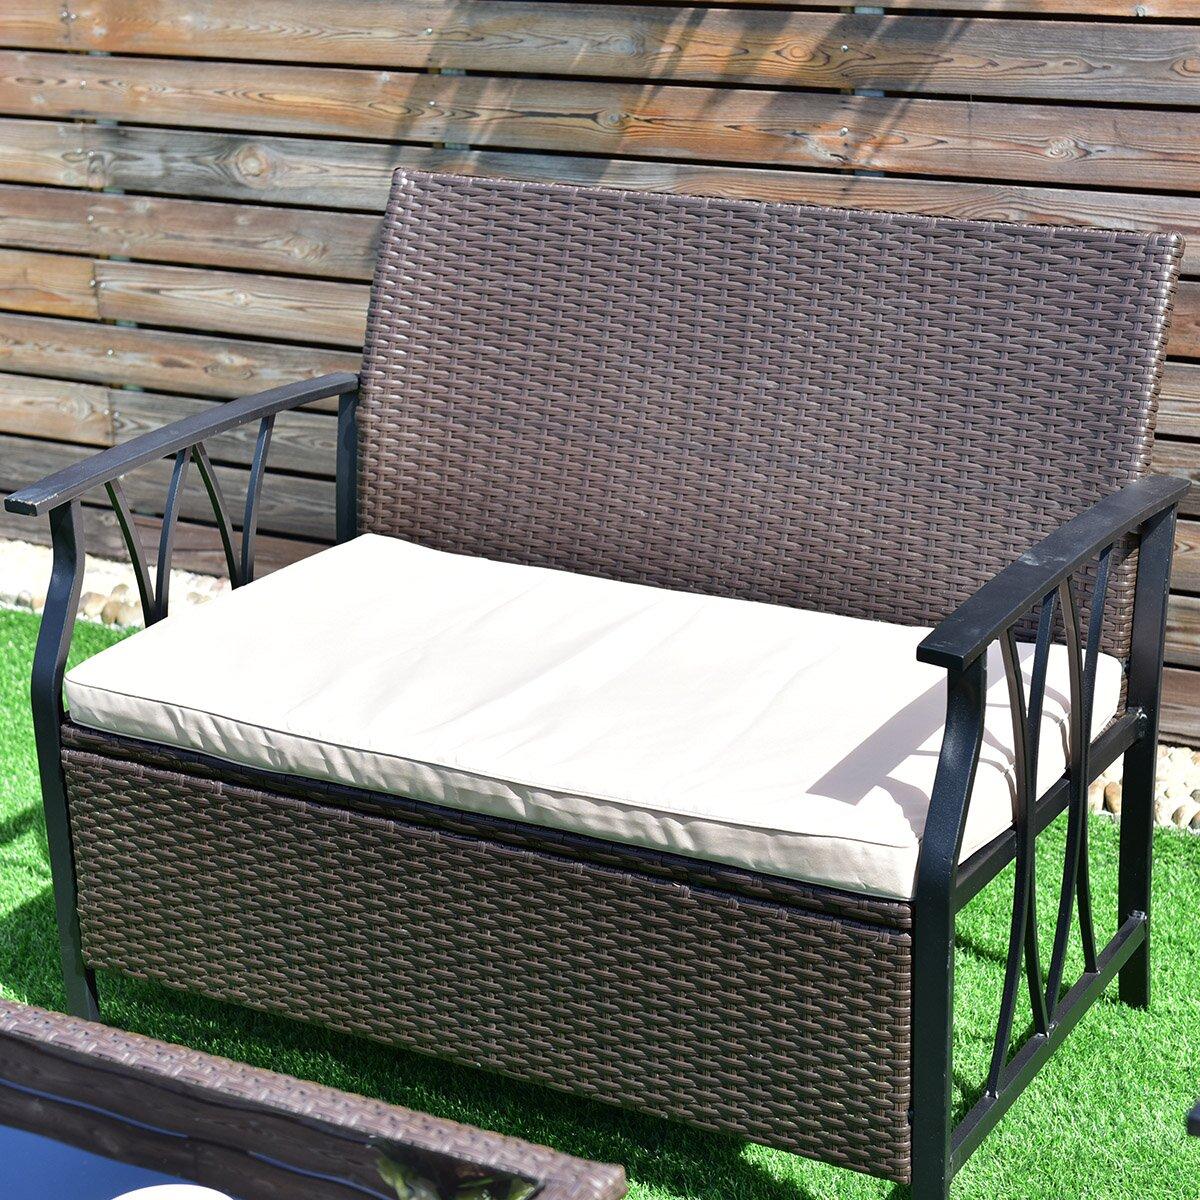 Gymax 4PC Rattan Wicker Furniture Set Cushion Outdoor Patio Garden Deck - image 1 de 5